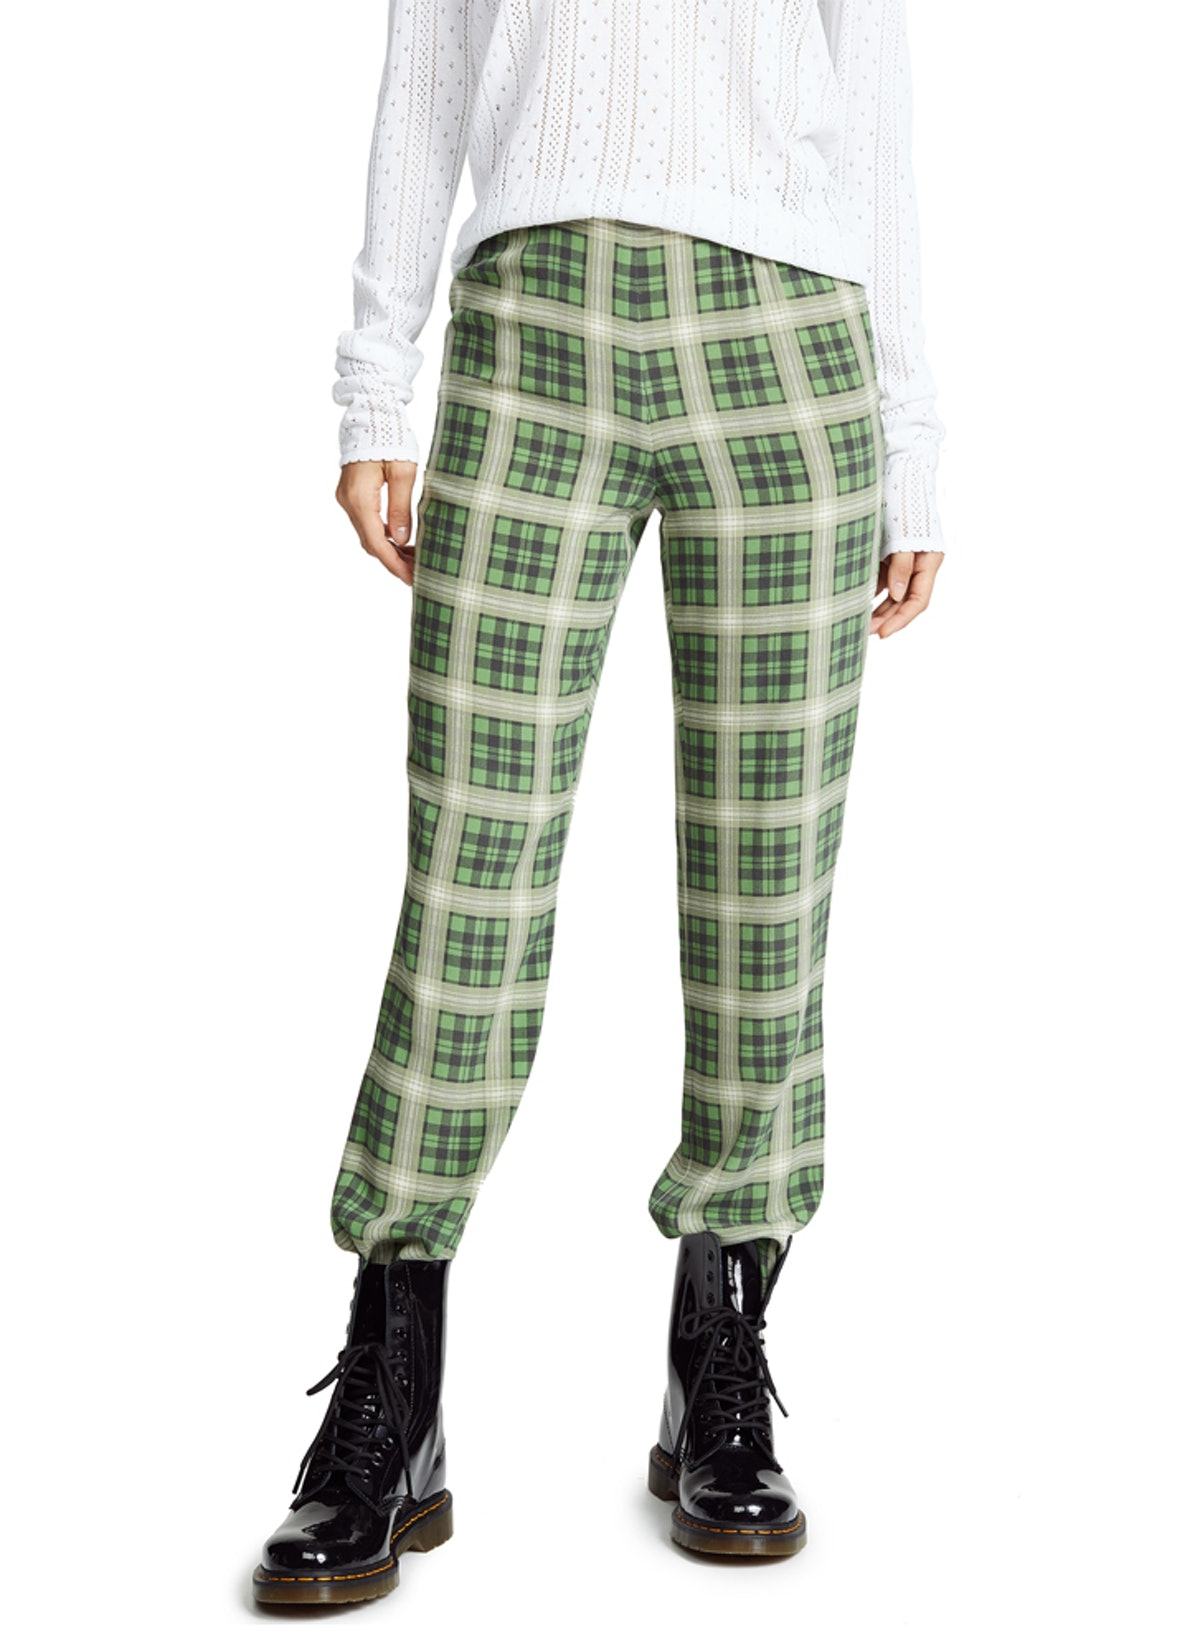 Redux Grunge Plaid Trousers